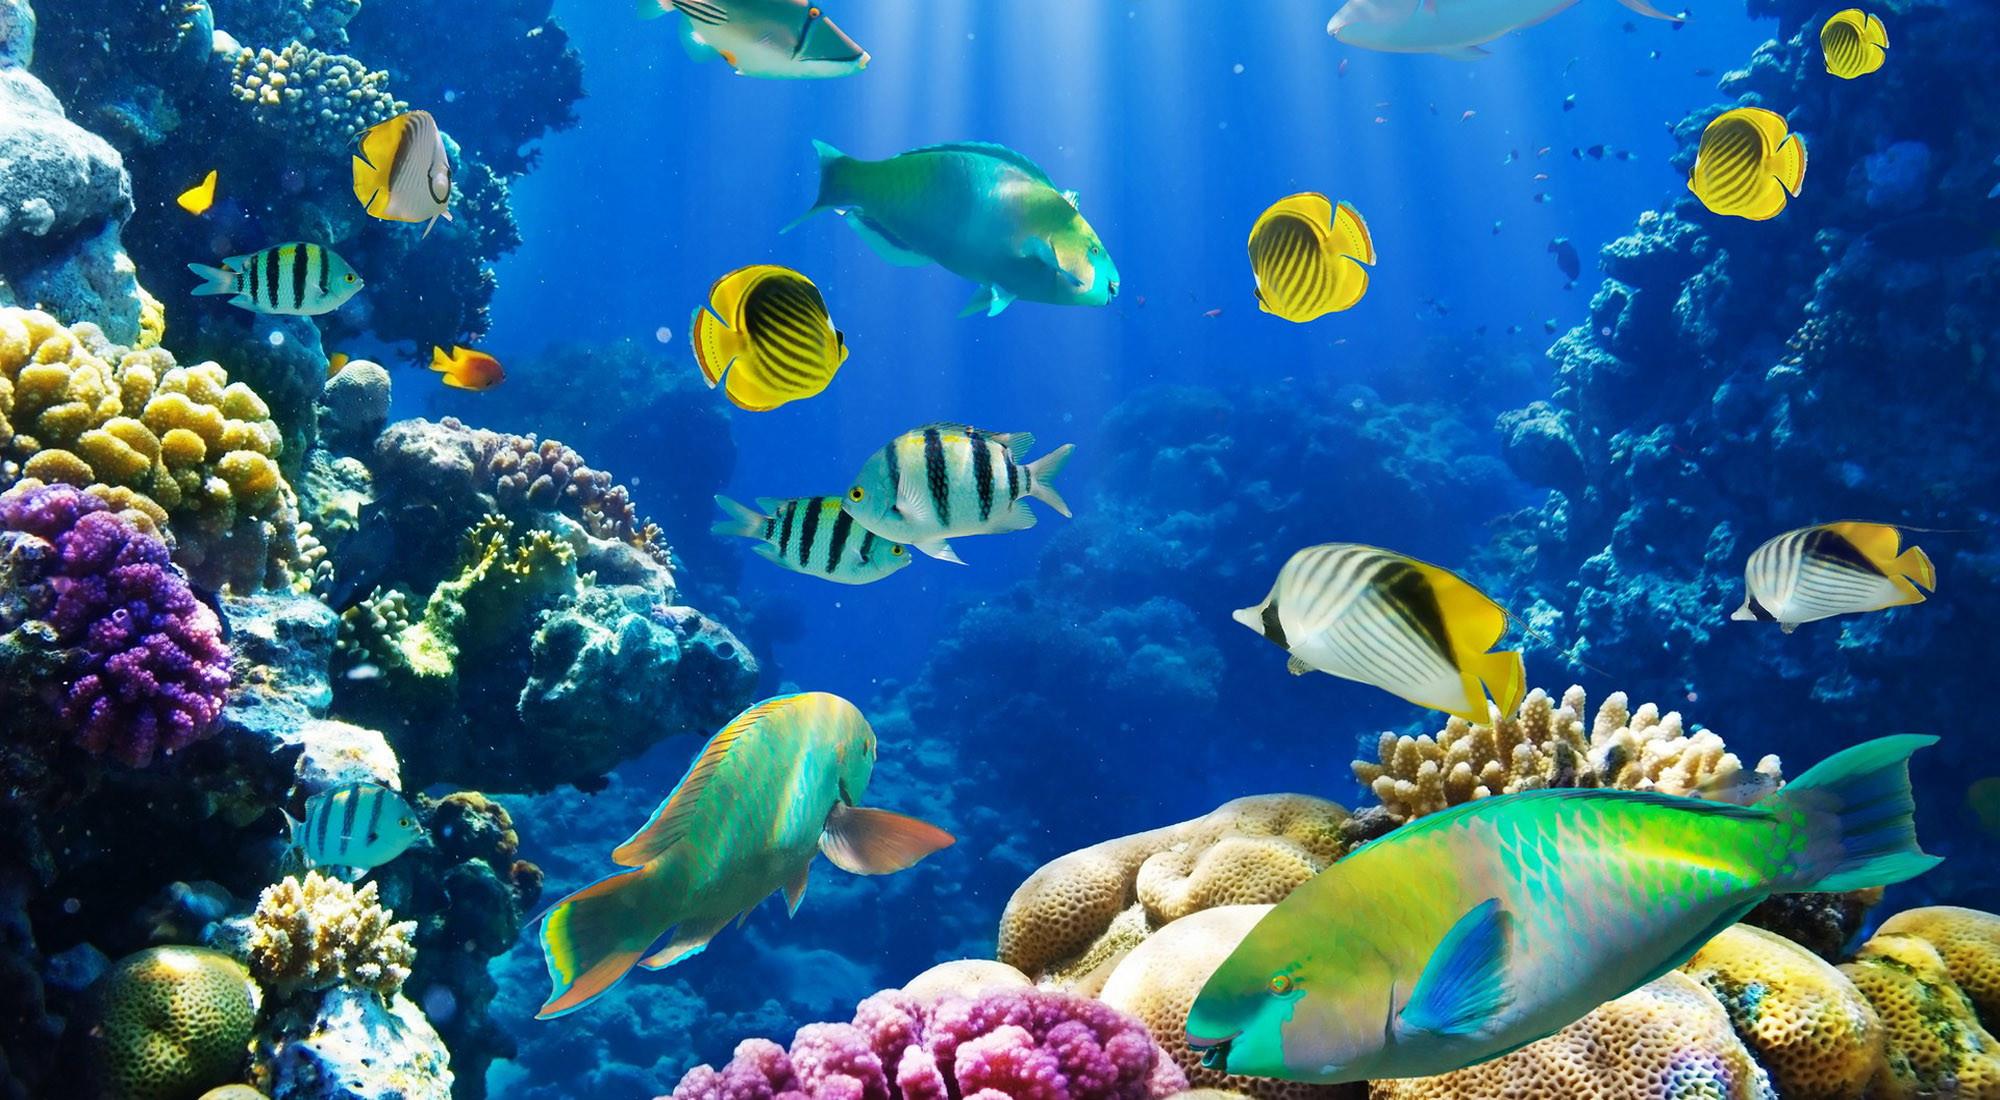 Fish Wallpapers For Desktop Free Download